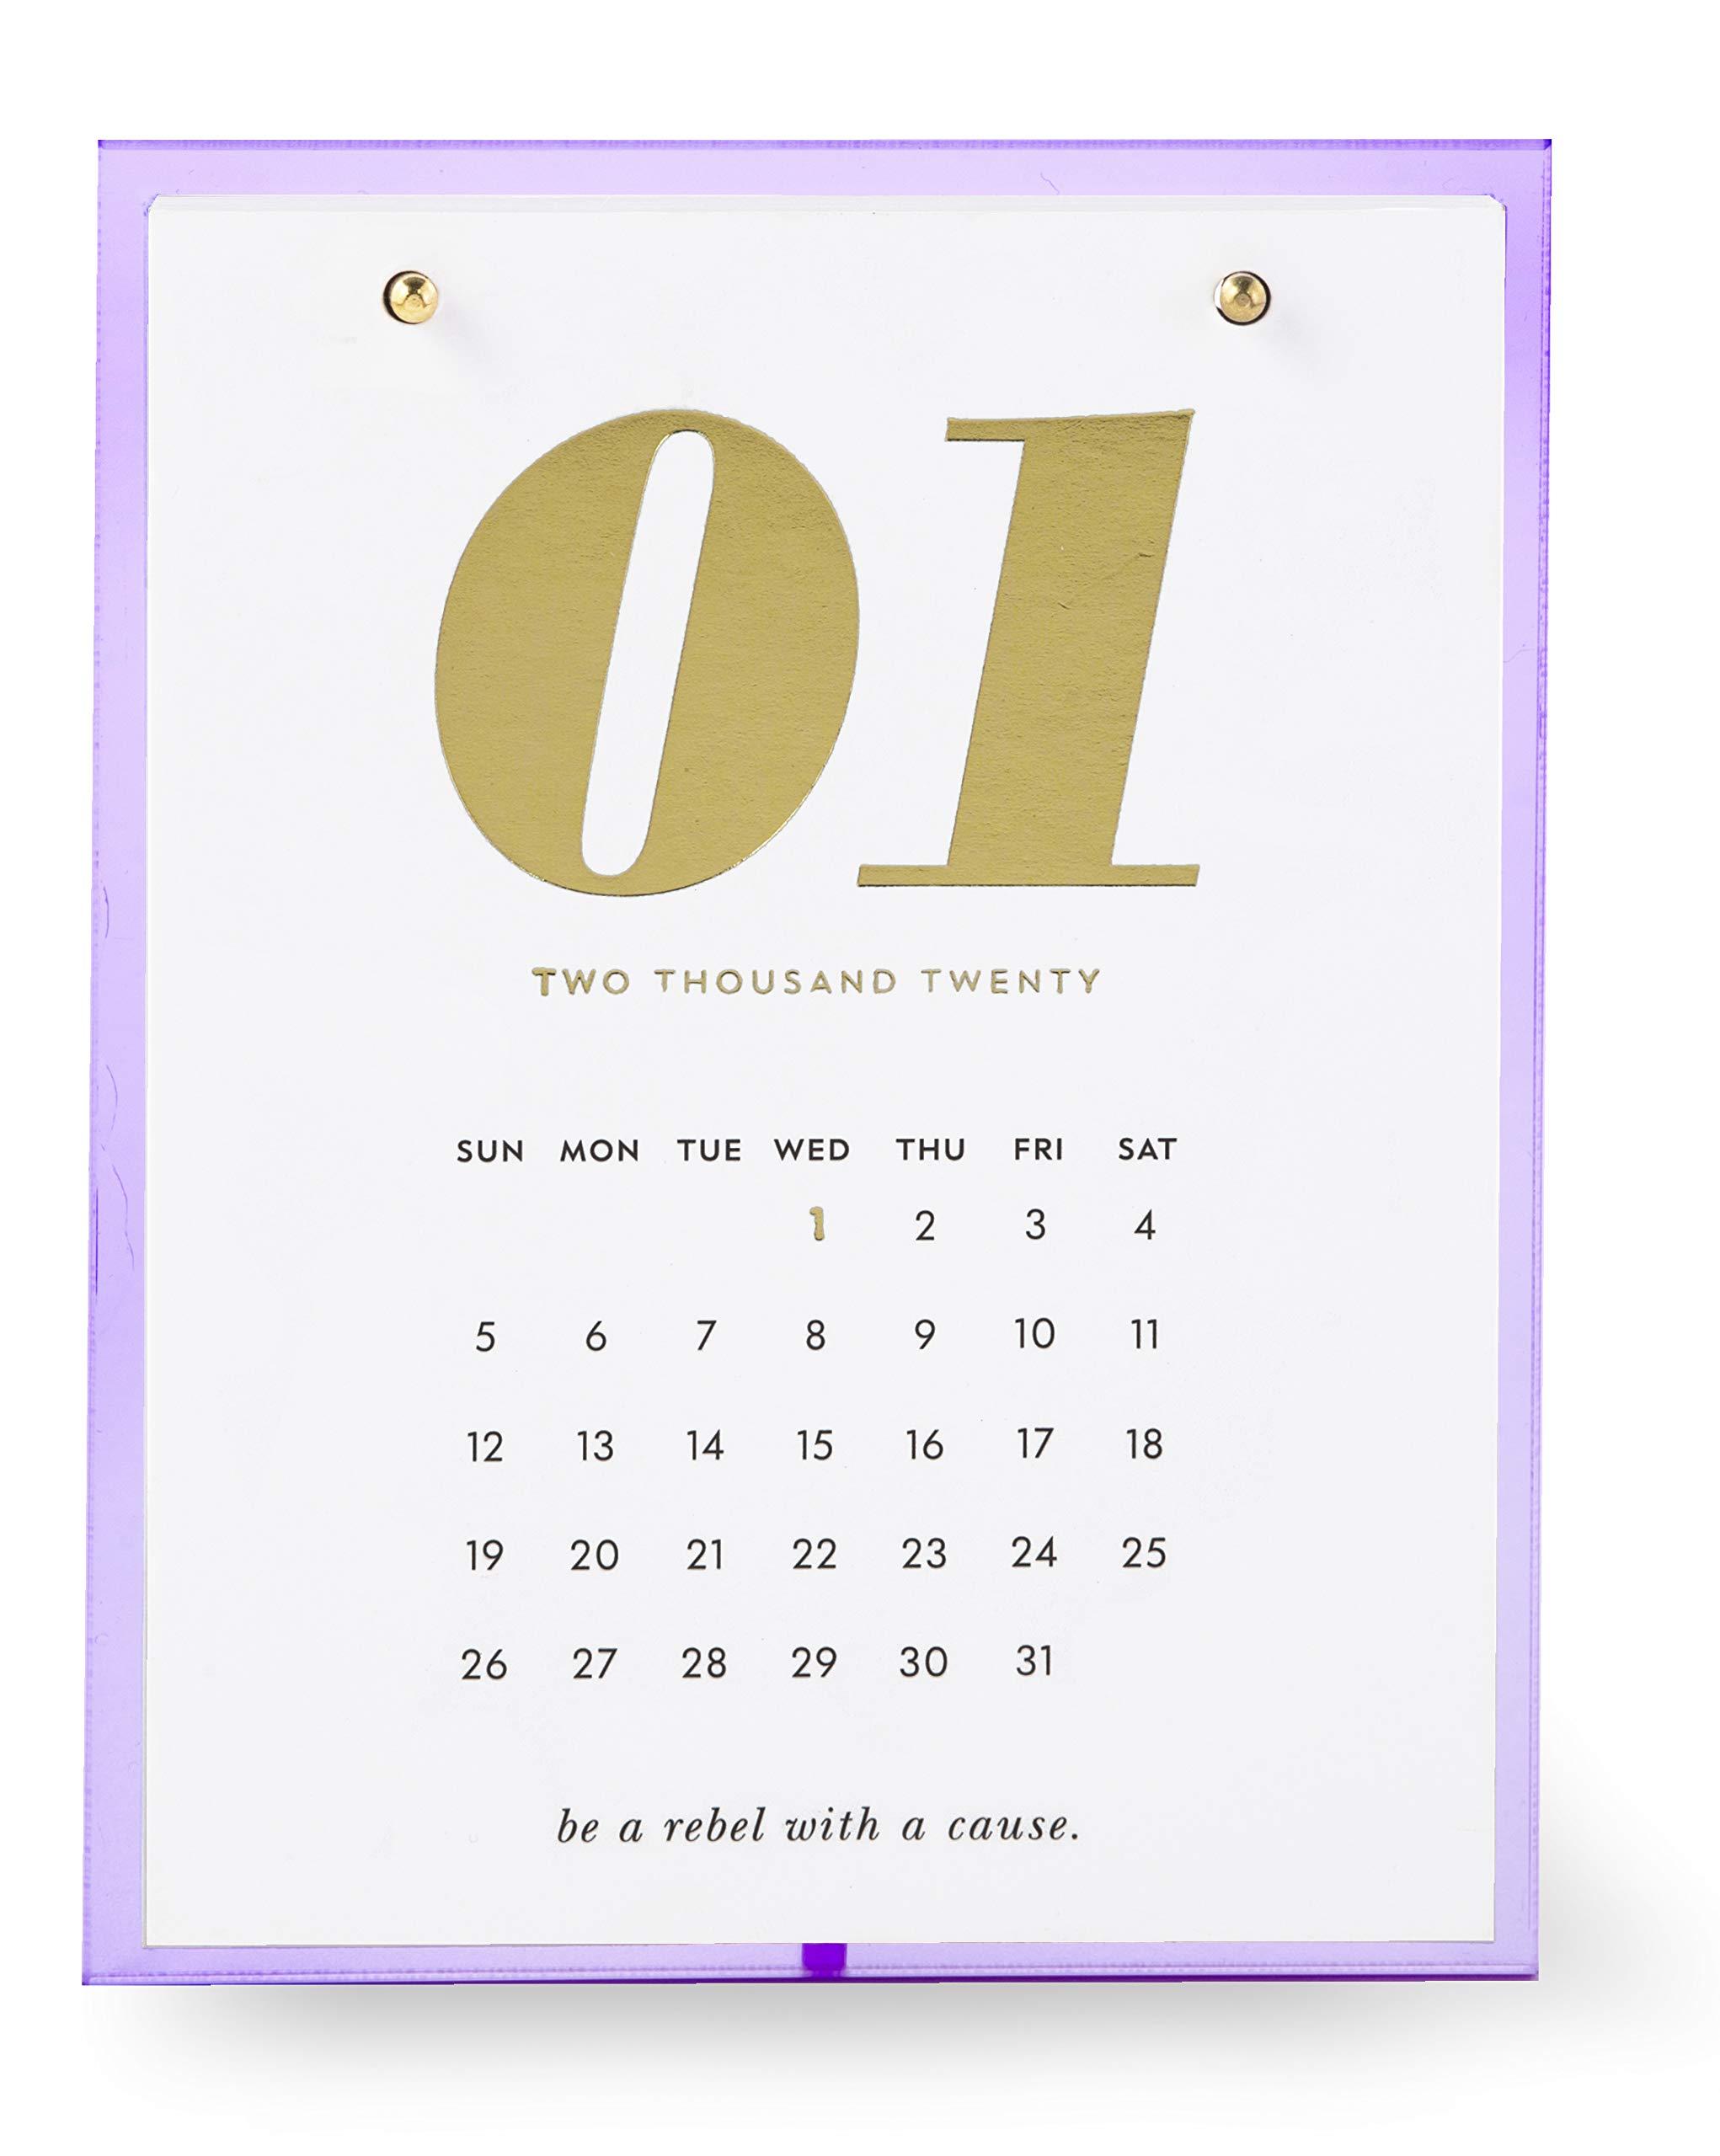 Kate Spade New York 12 Month Desktop Calendar, Dated January 2020 - December 2020, Lilac by Kate Spade New York